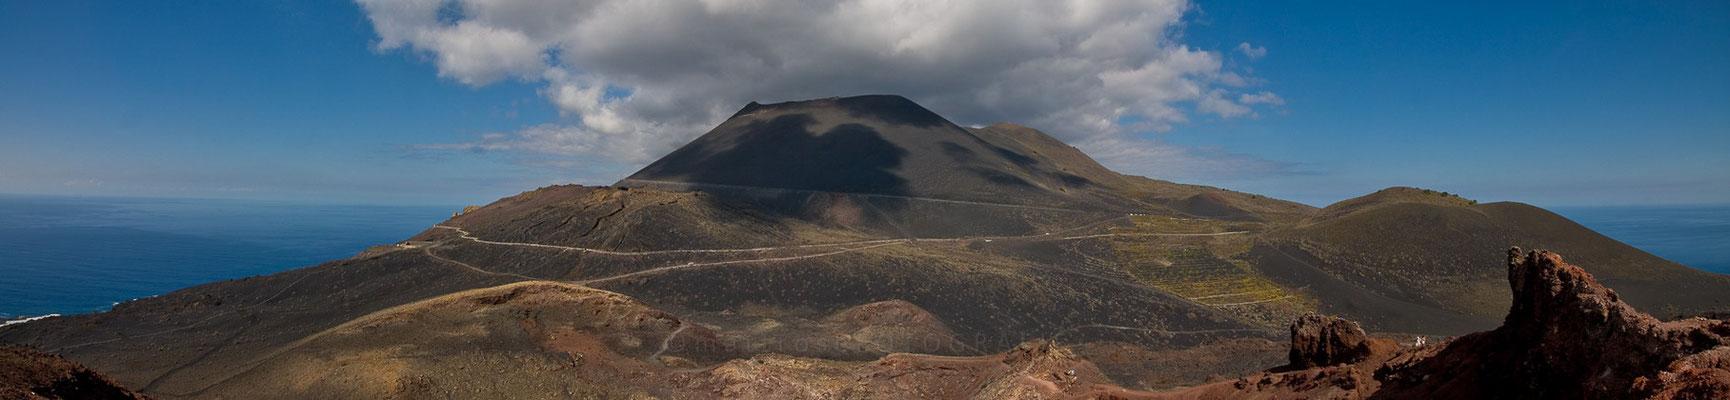 La Palma - Vulkan Teneguia